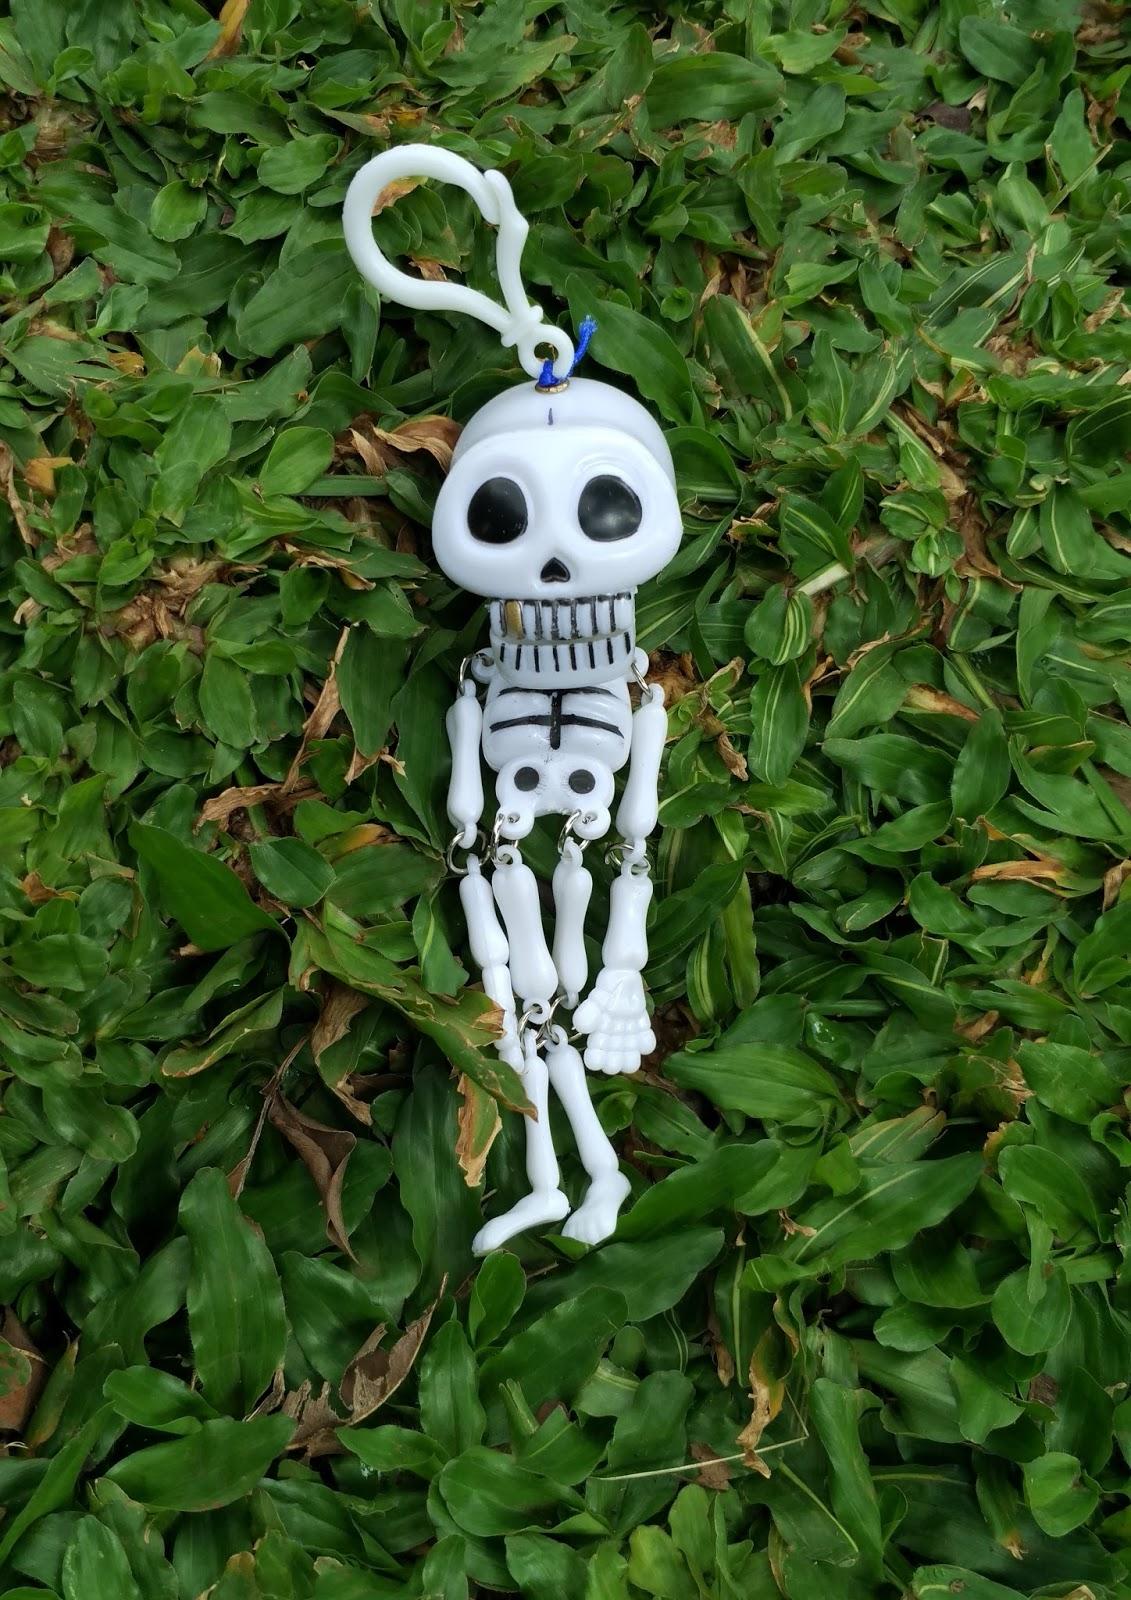 Gantungan Kunci Tengkorak Lucu, souvenir, gantungan kunci, pernak pernik, mainan lucu, pernak pernik nightmare